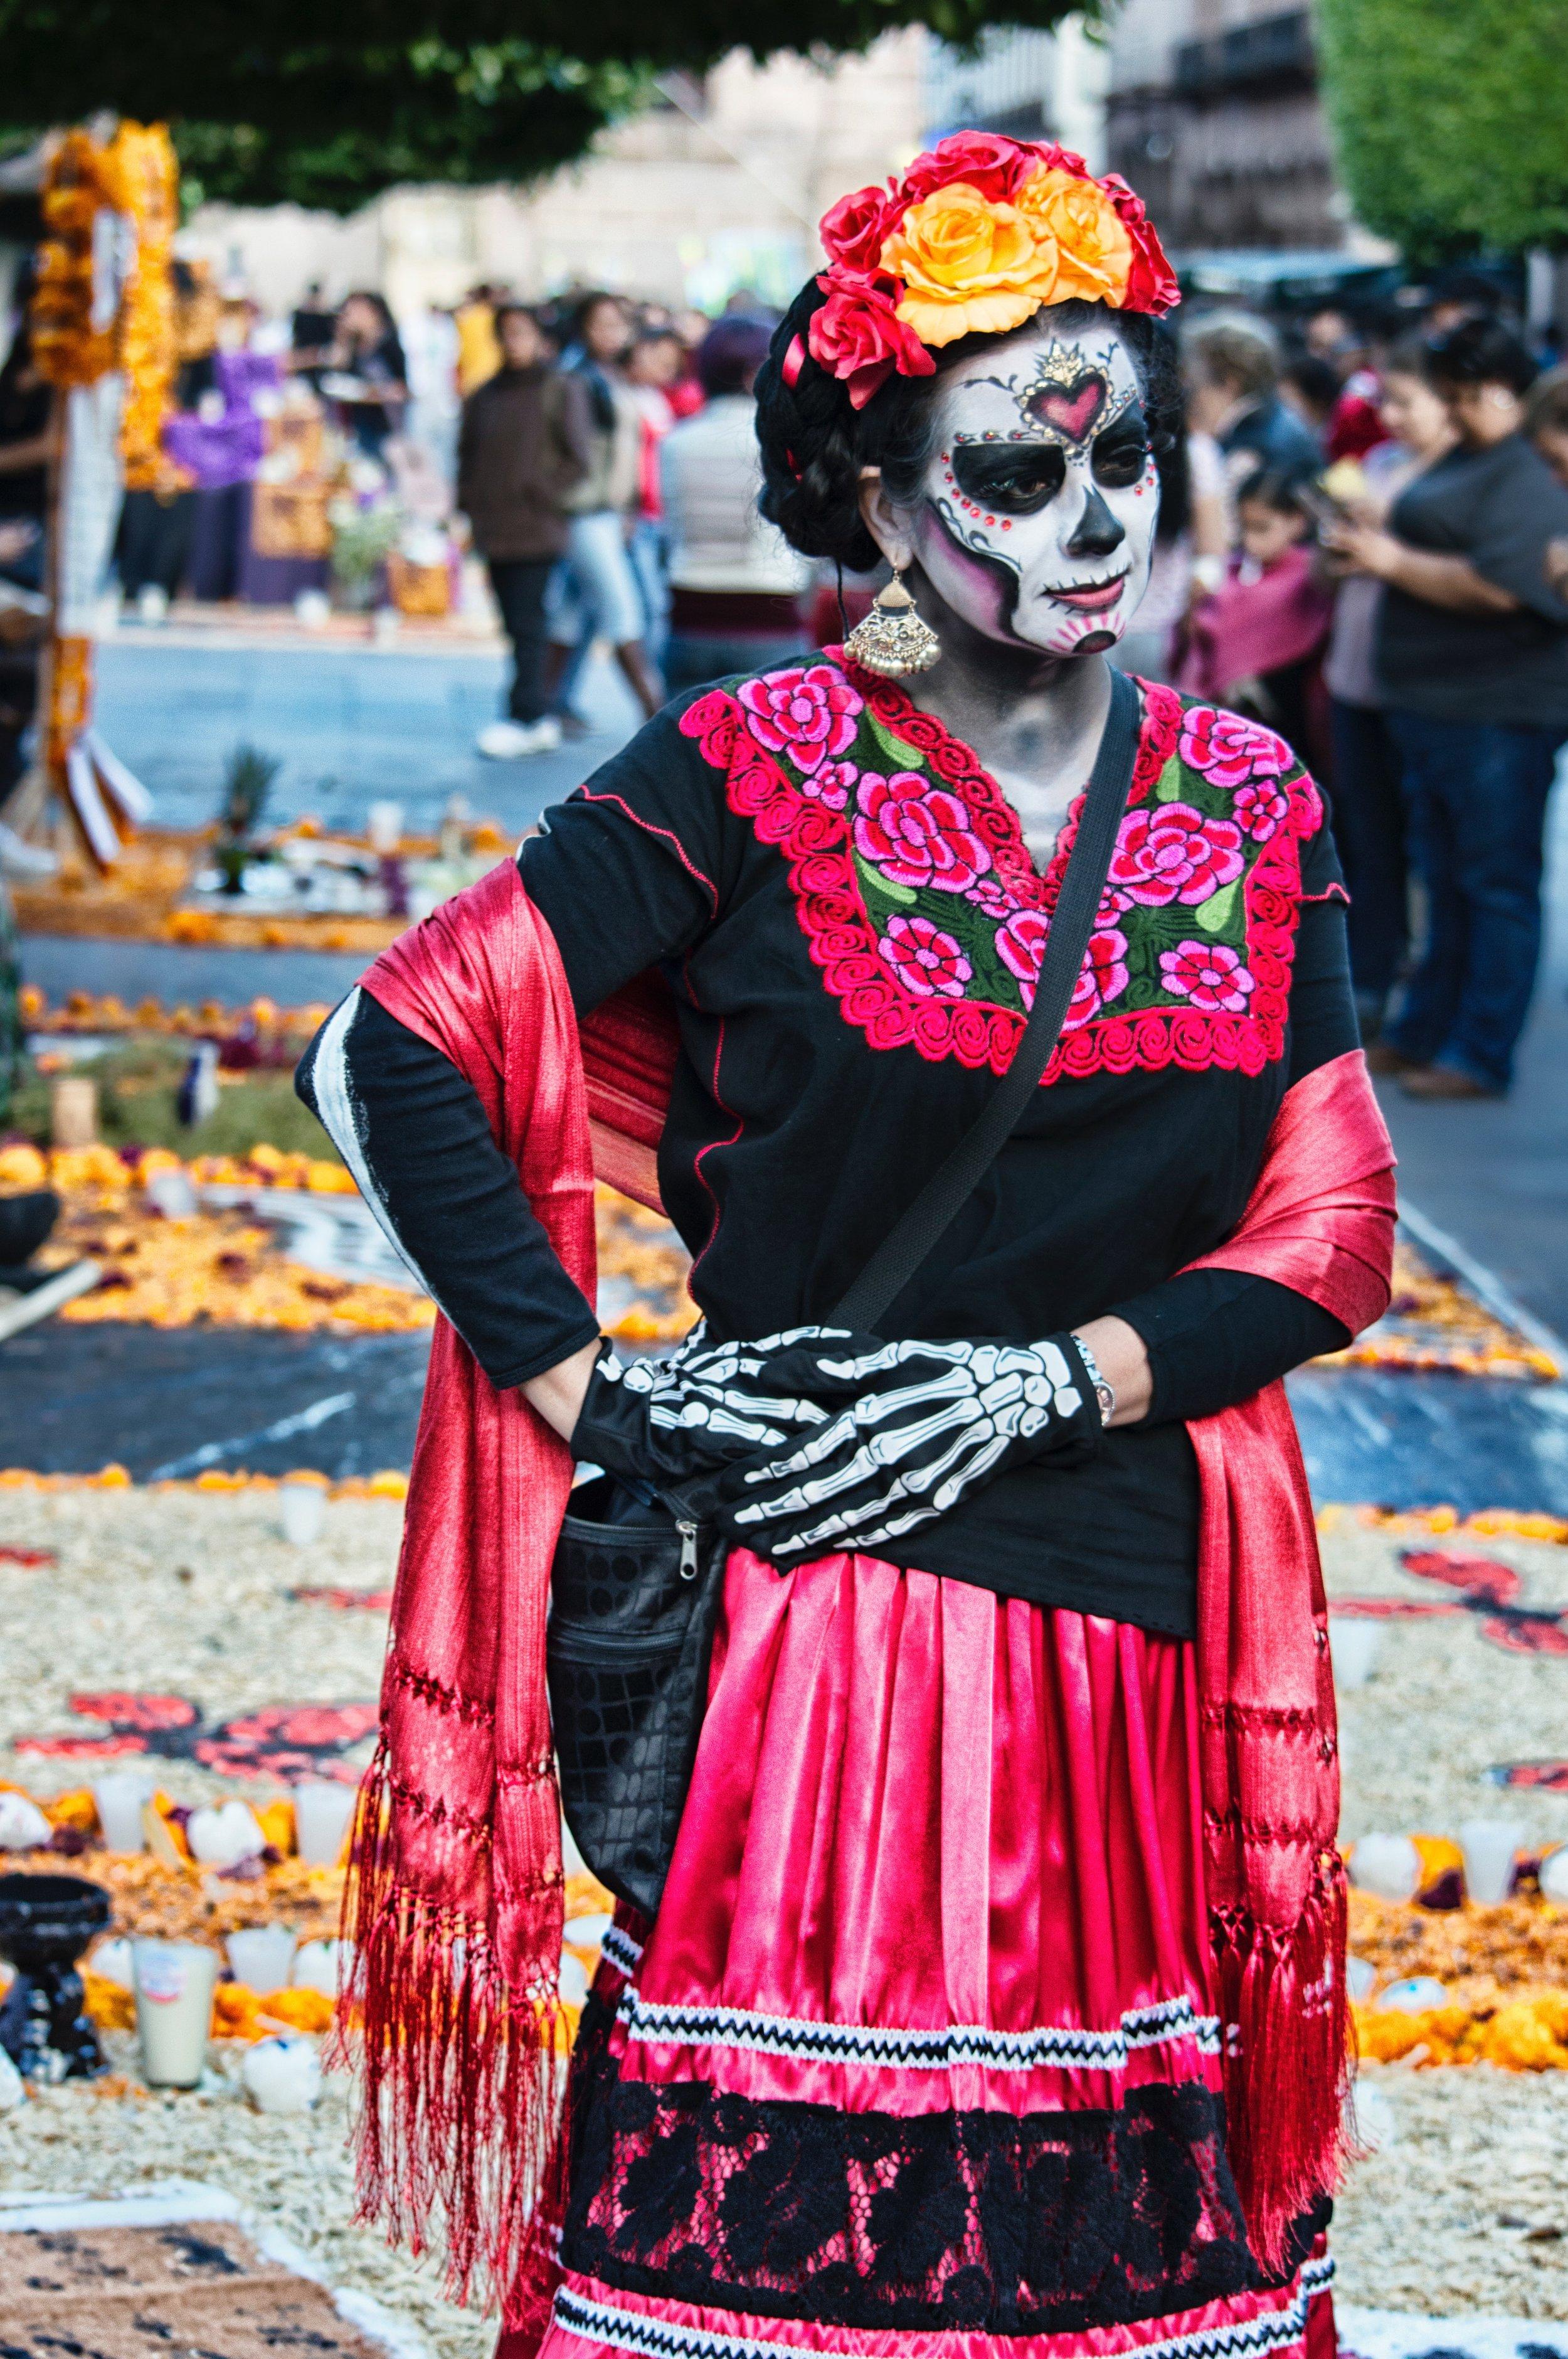 Organ Donation in the Hispanic Culture